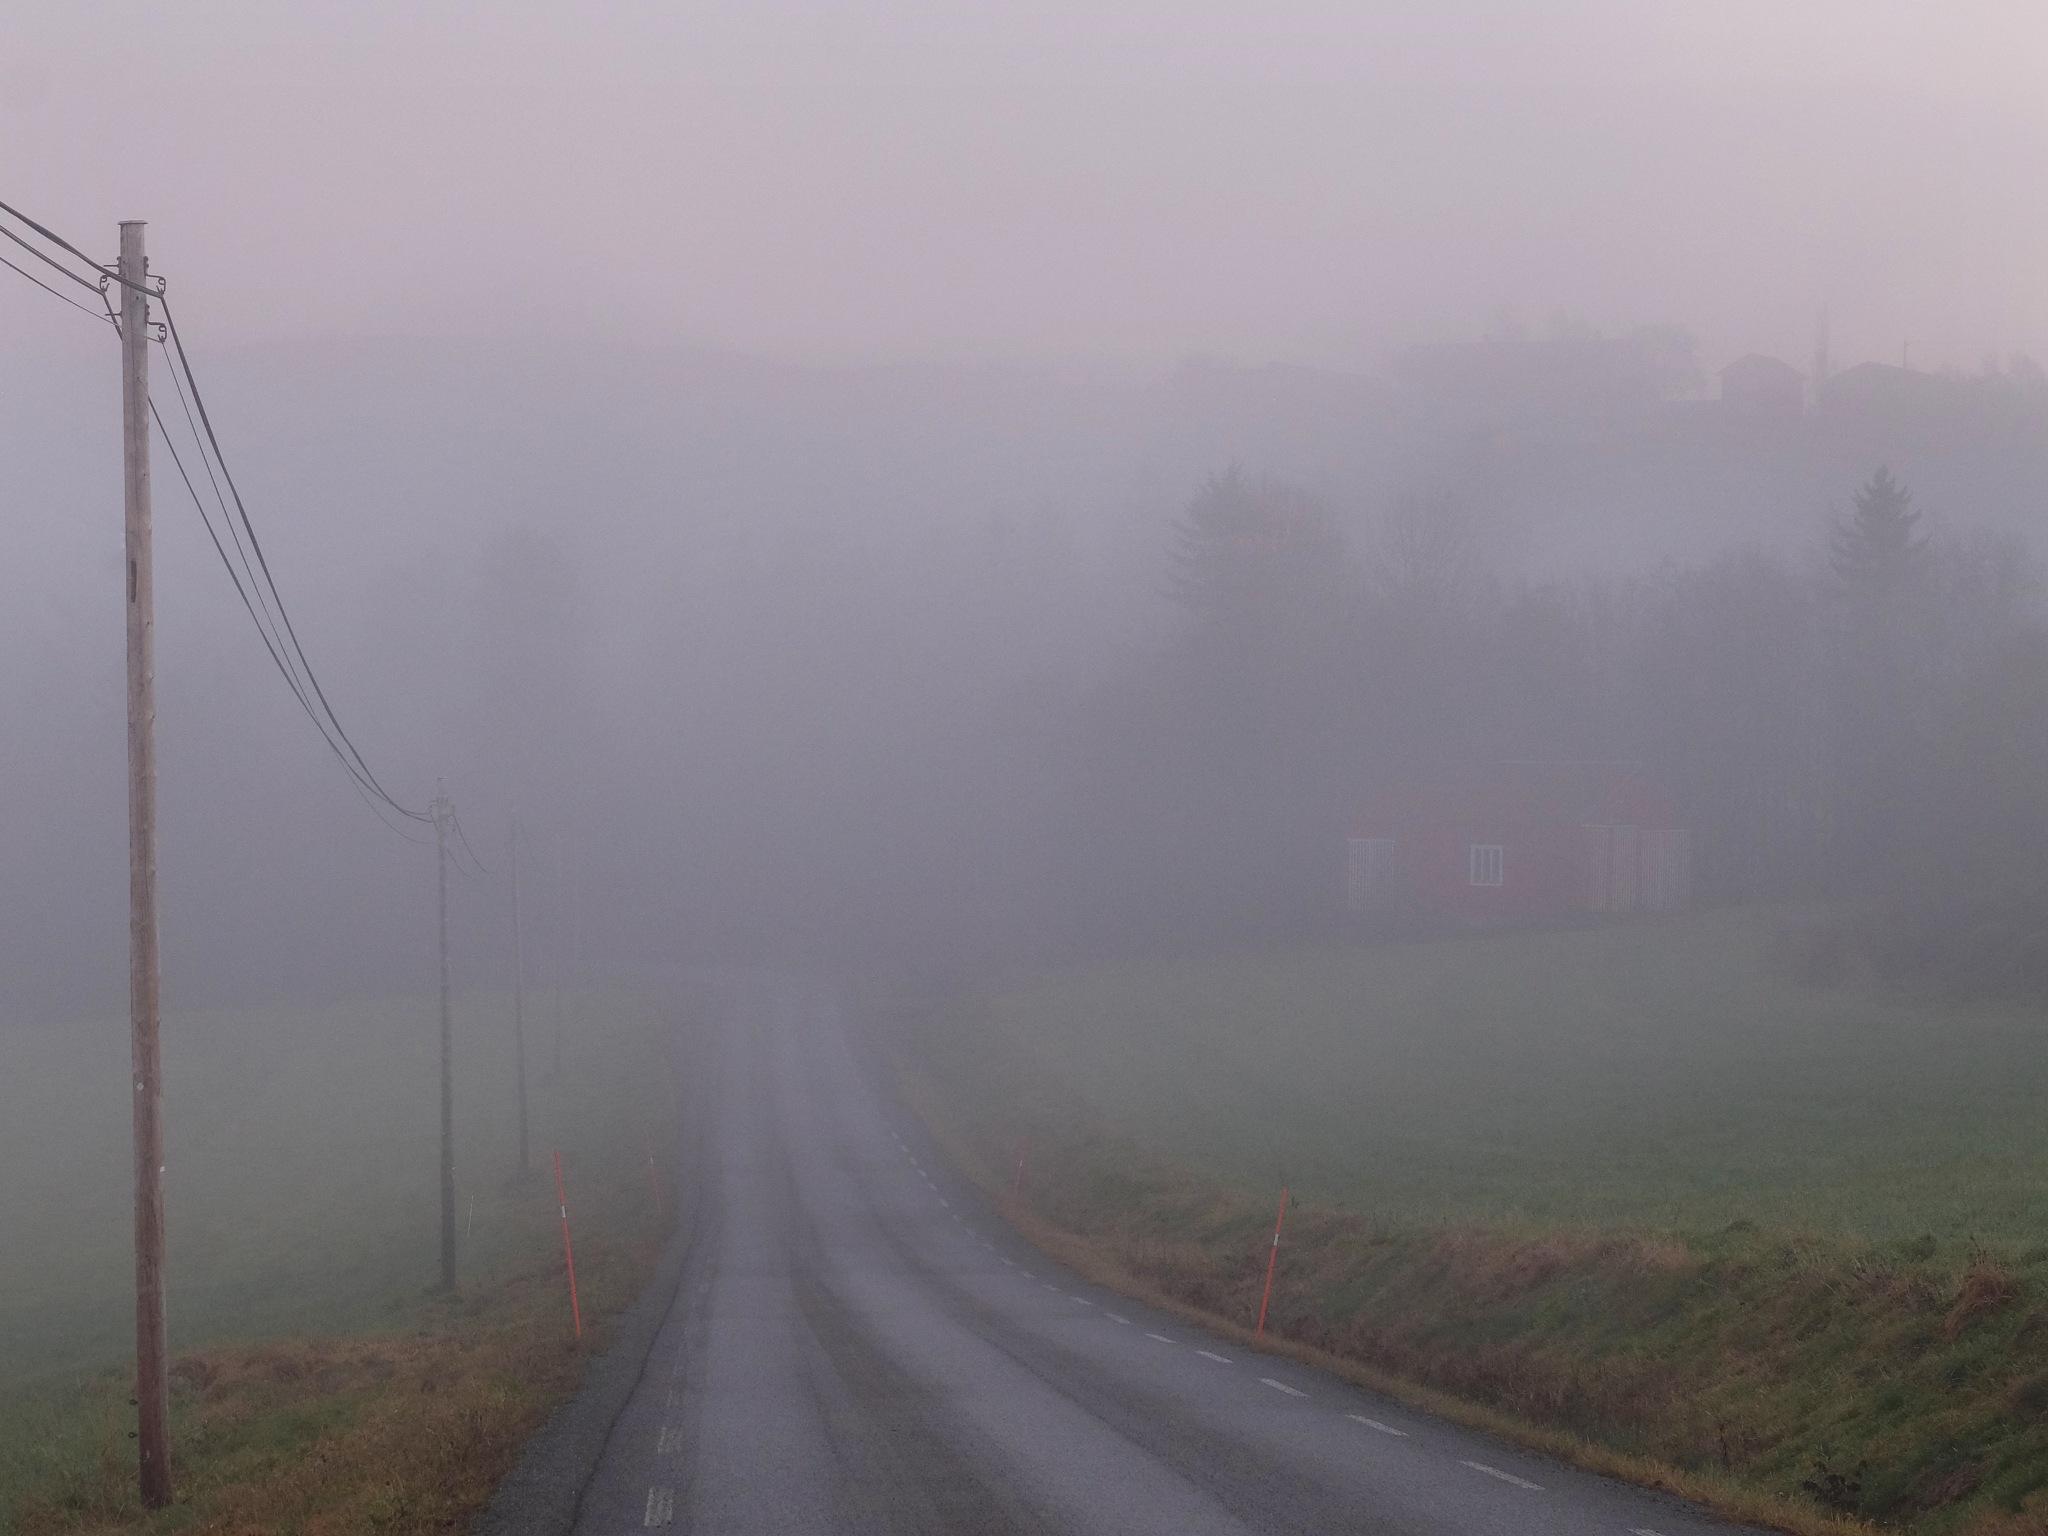 Rural Road by Jan Arvid Solem